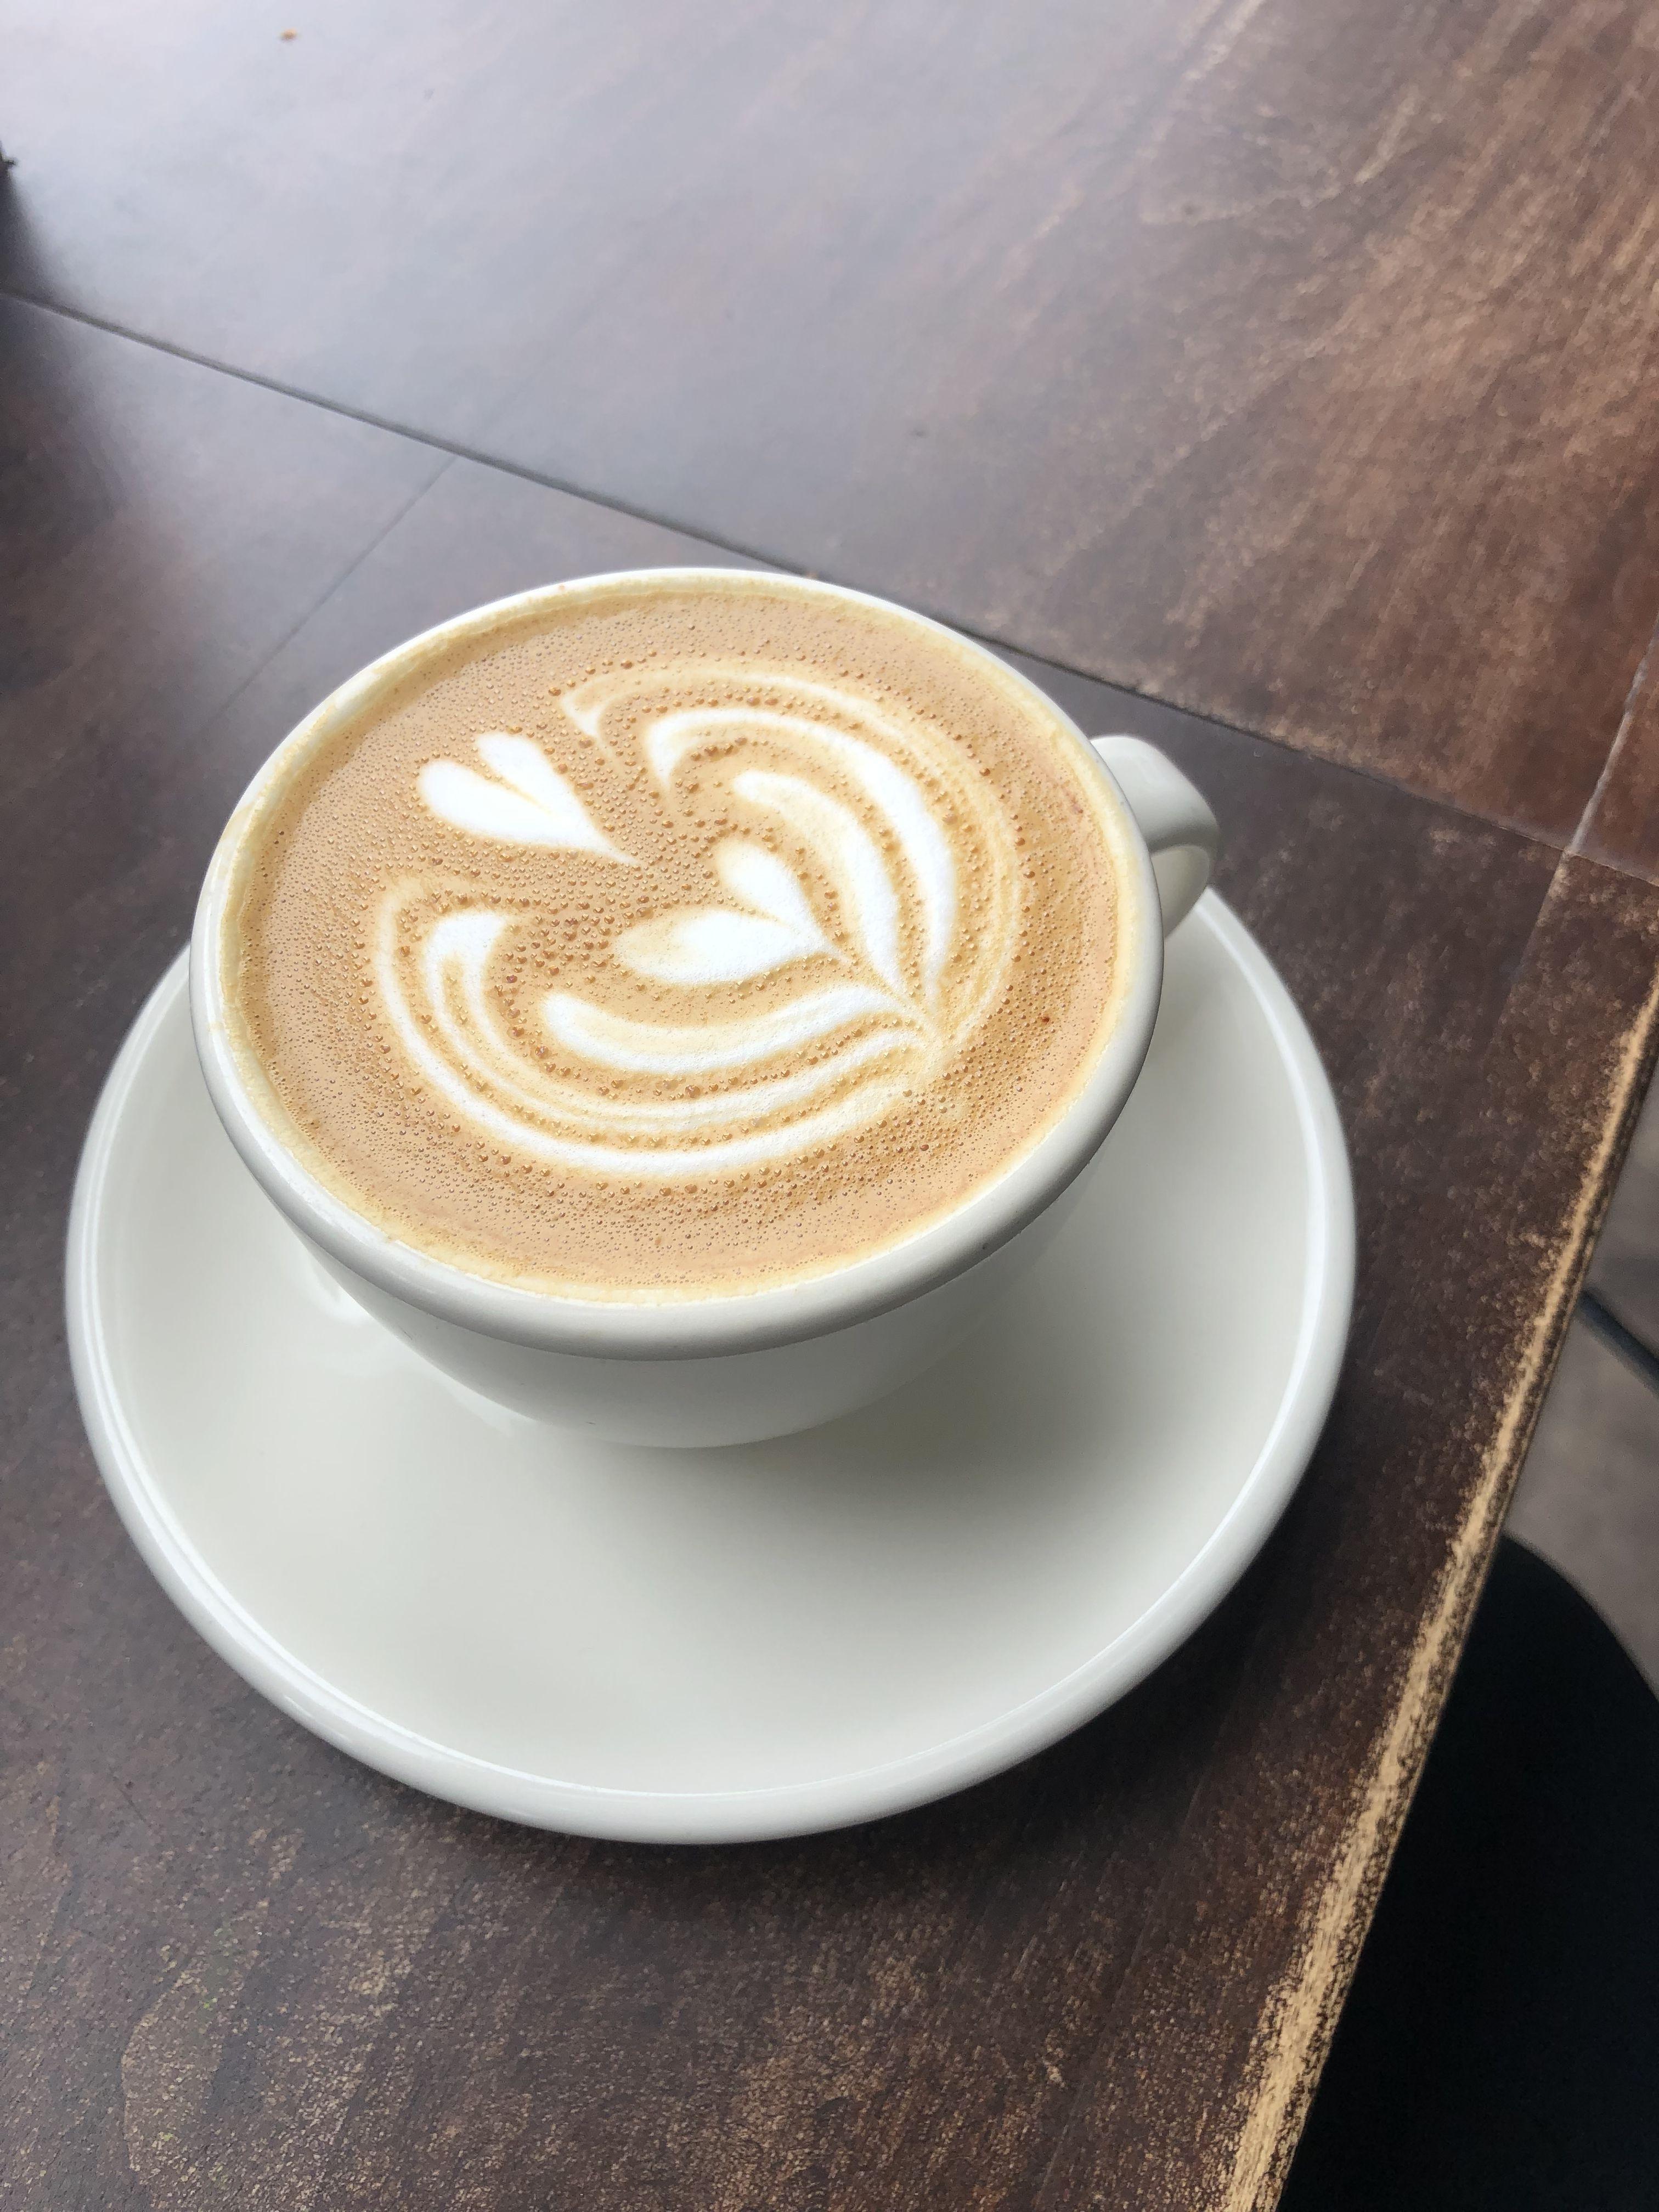 Cuppacino From Bad Coffee In Costa Mesa Coffee Recipes Bad Coffee Coffee Love